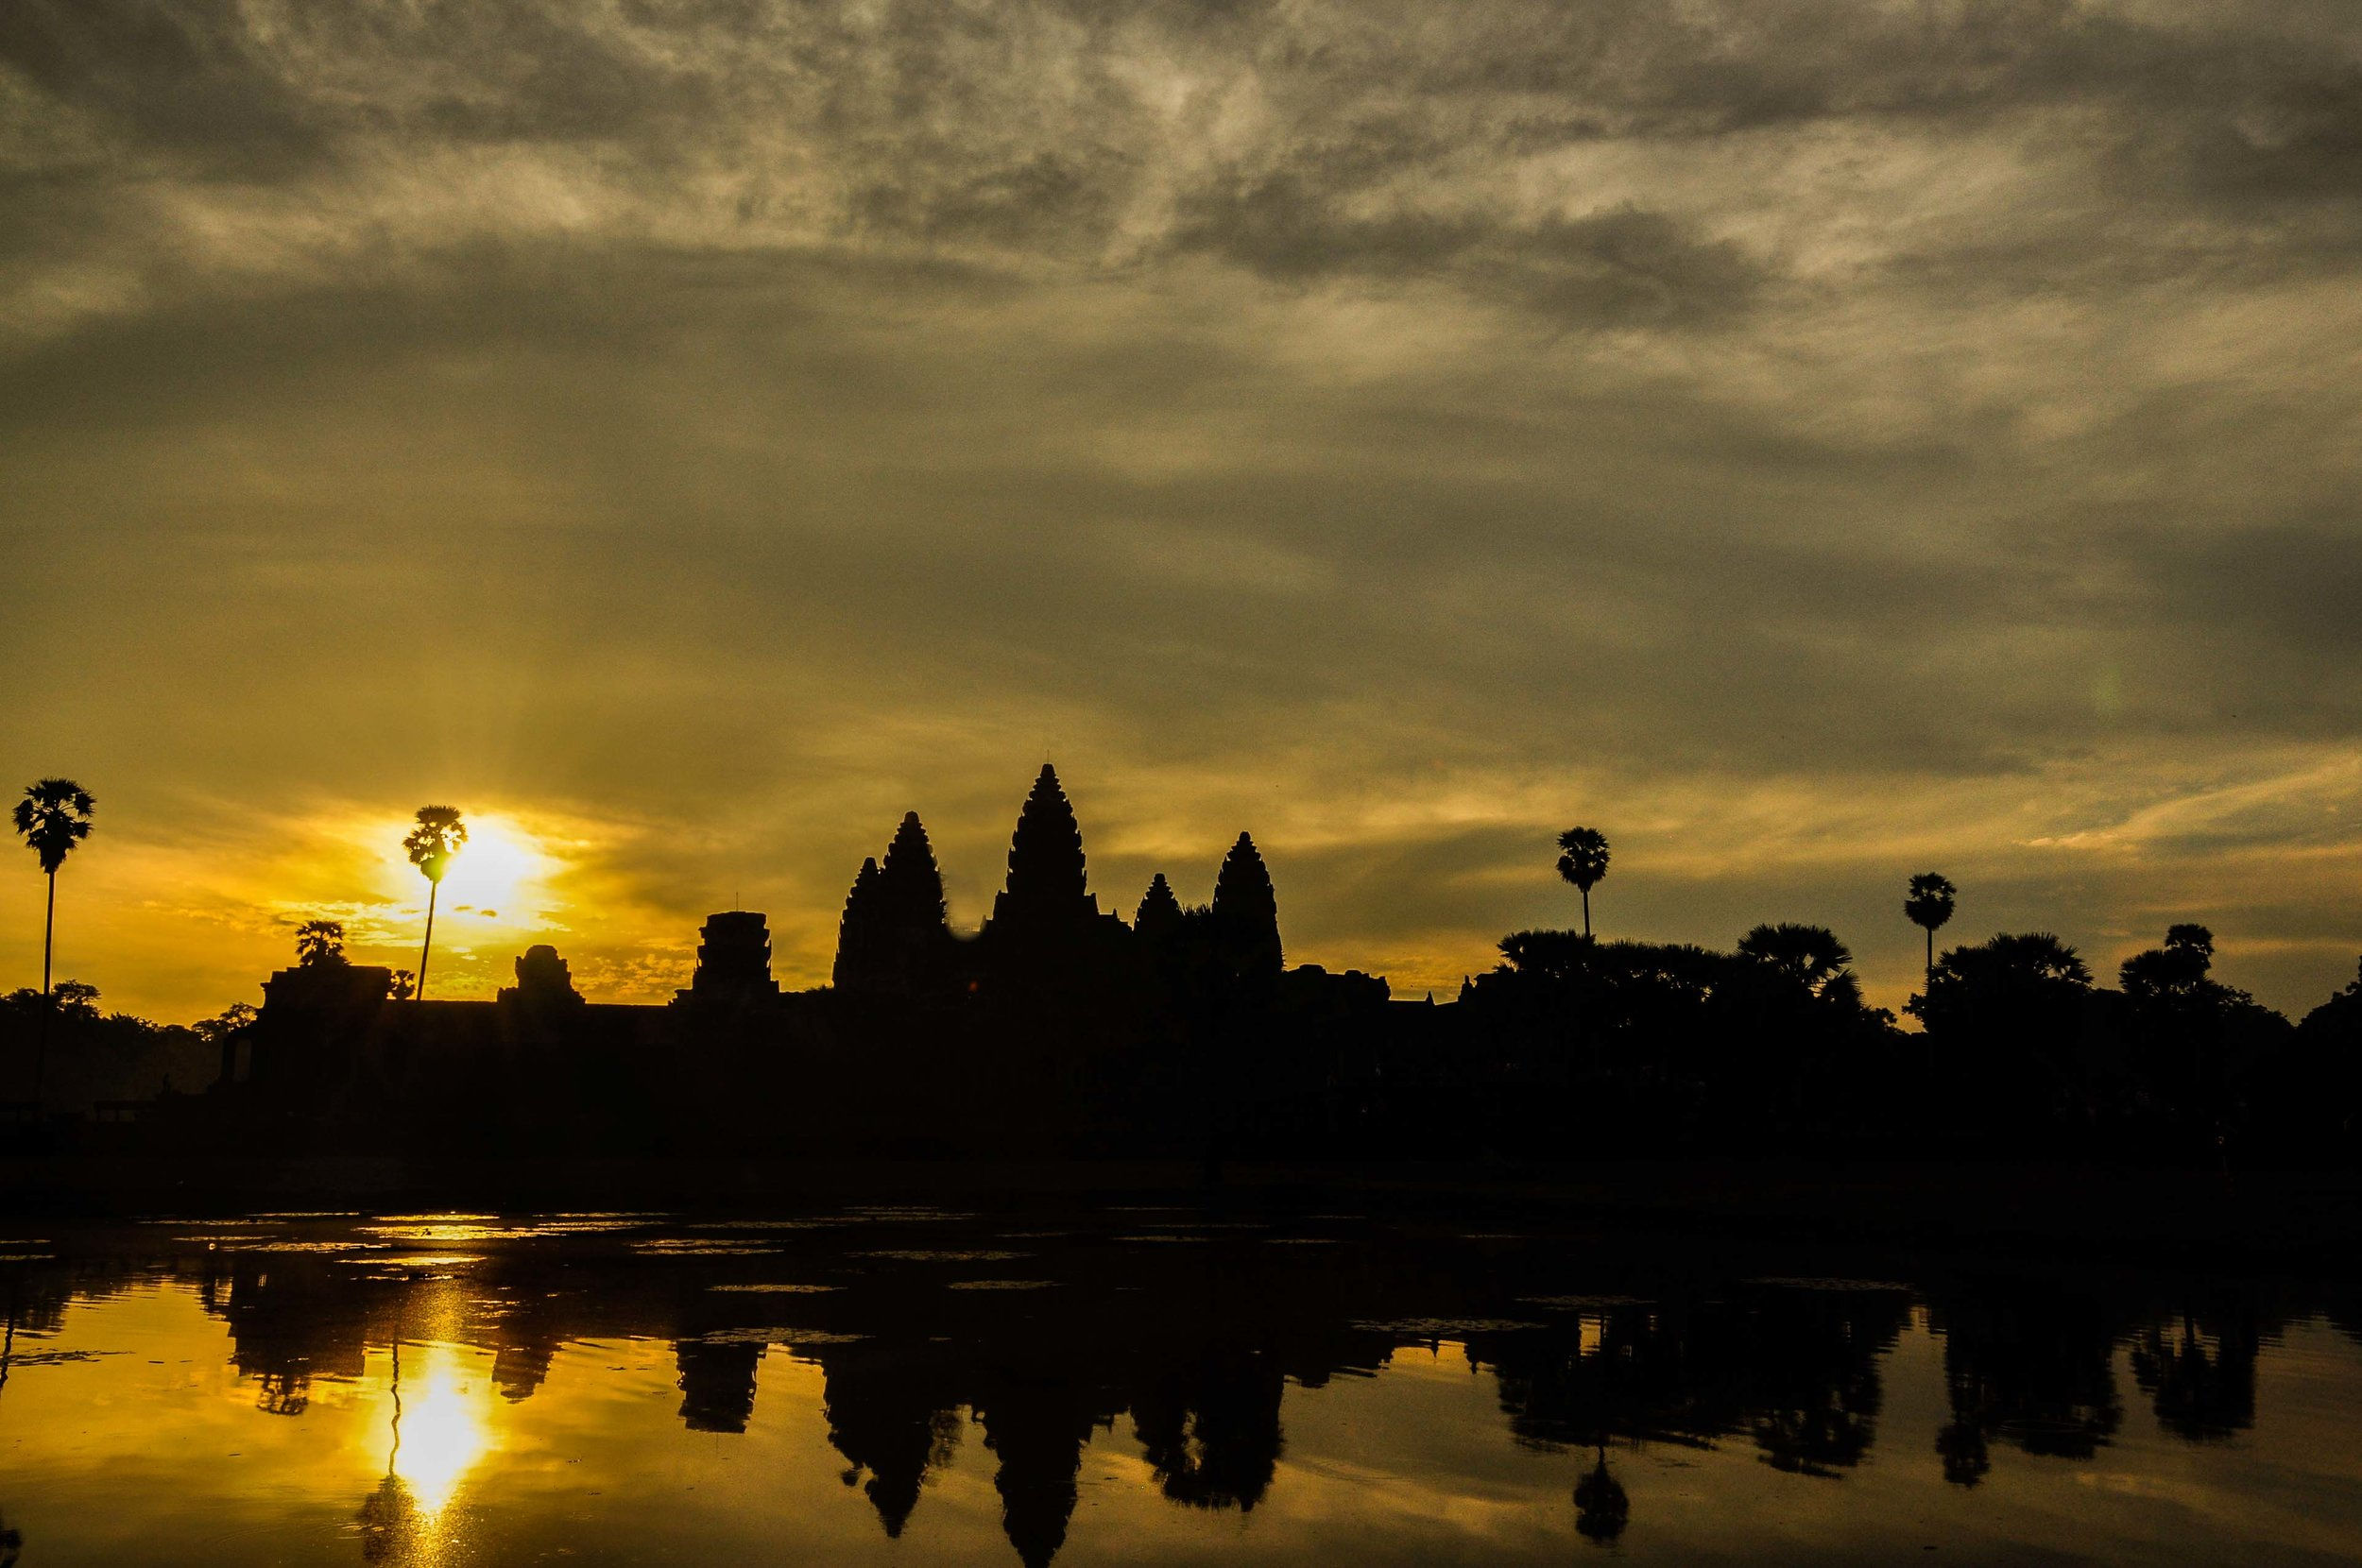 Angkor Wat, Siem Reap, Cambodia 2009